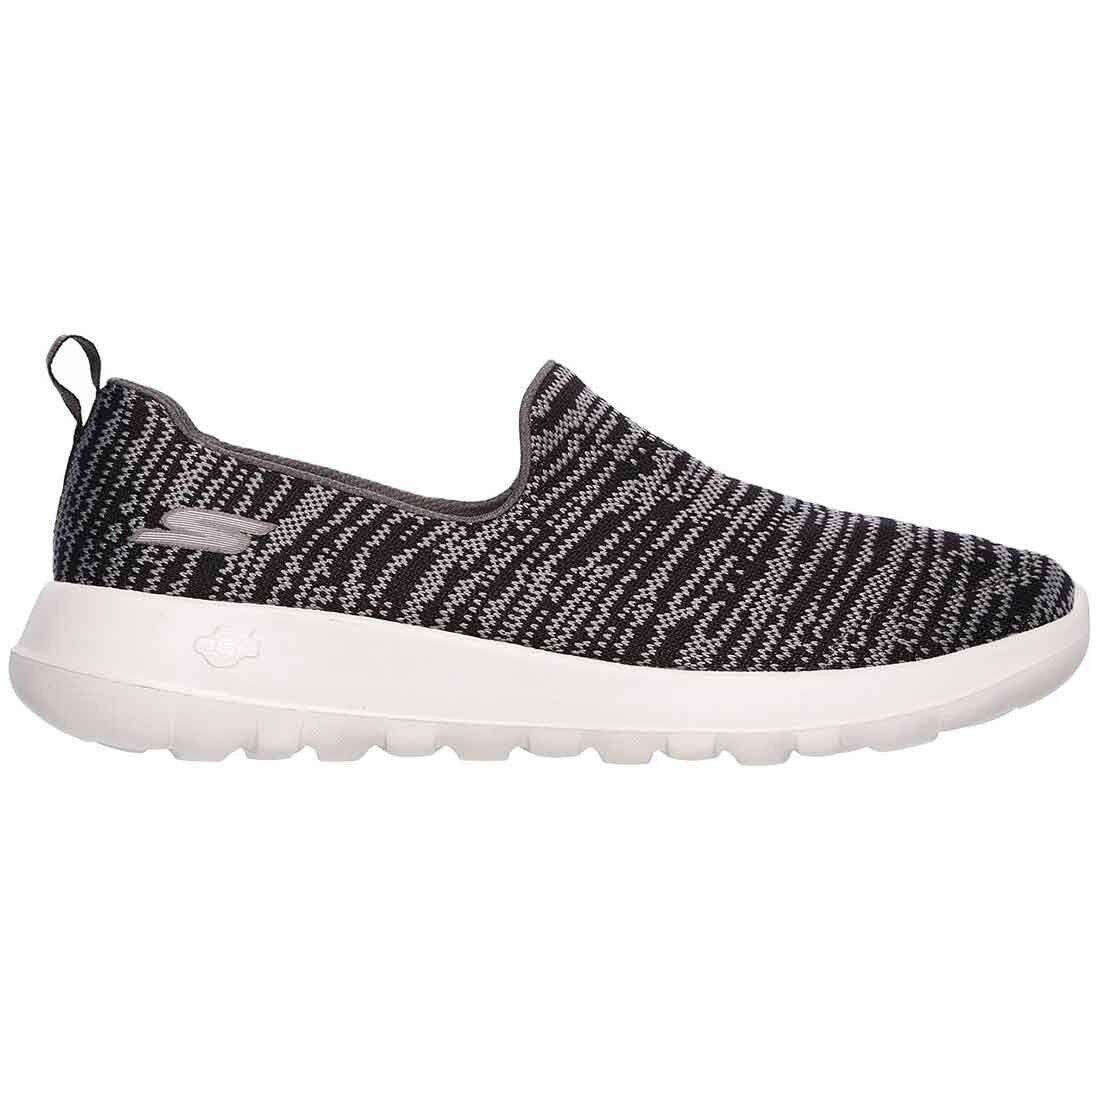 Skechers GOwalk Max Infinite Shoes Charcoal/Black - 54602-CCBK Cheap and beautiful fashion